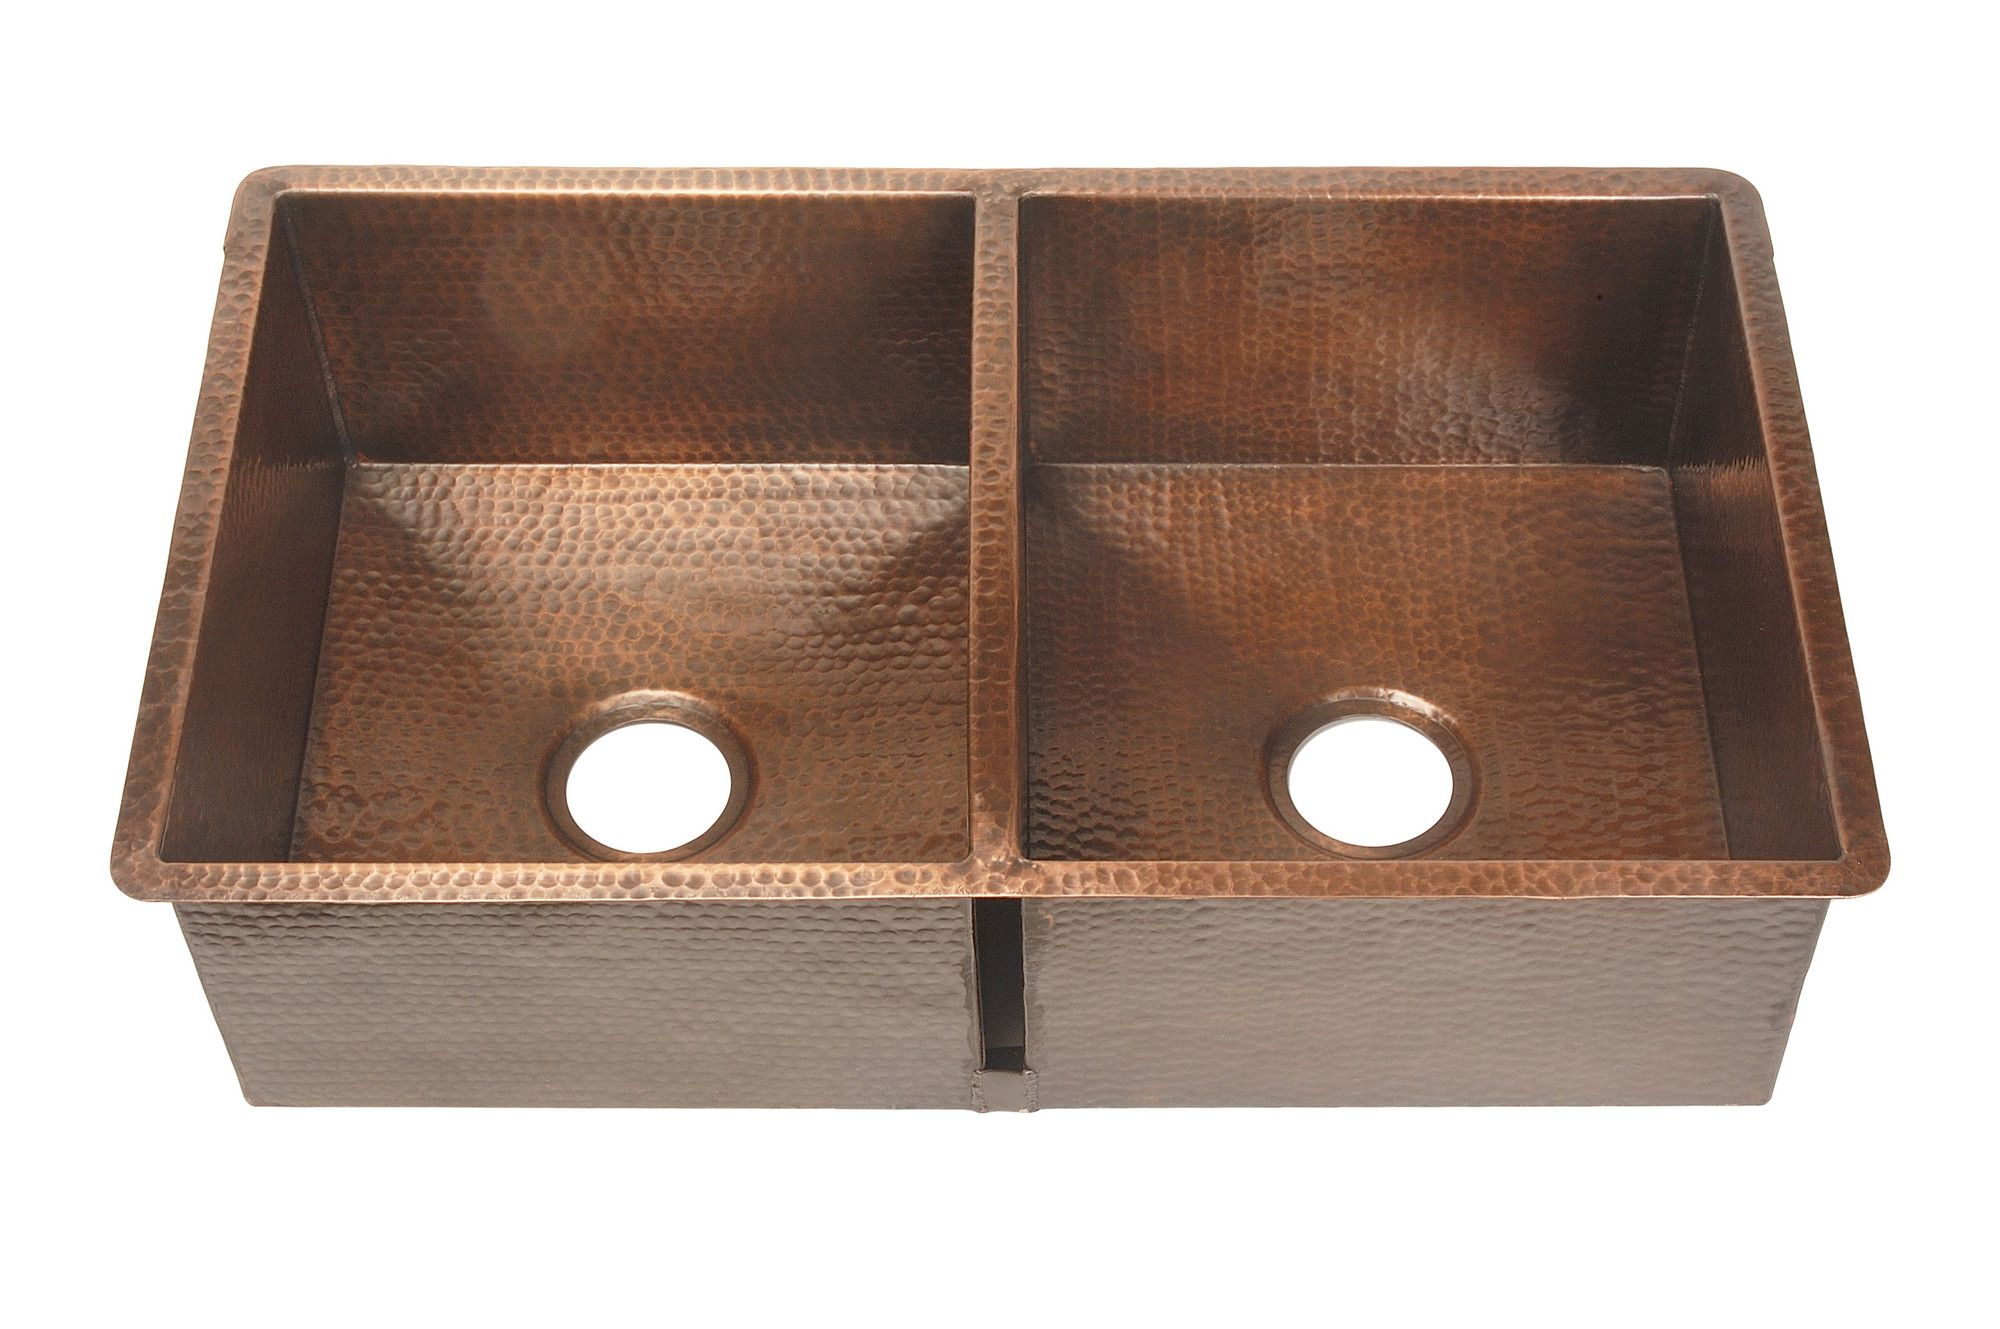 Beautiful Copper Double Sink 32 X 20 Double Bowl Kitchen Sink